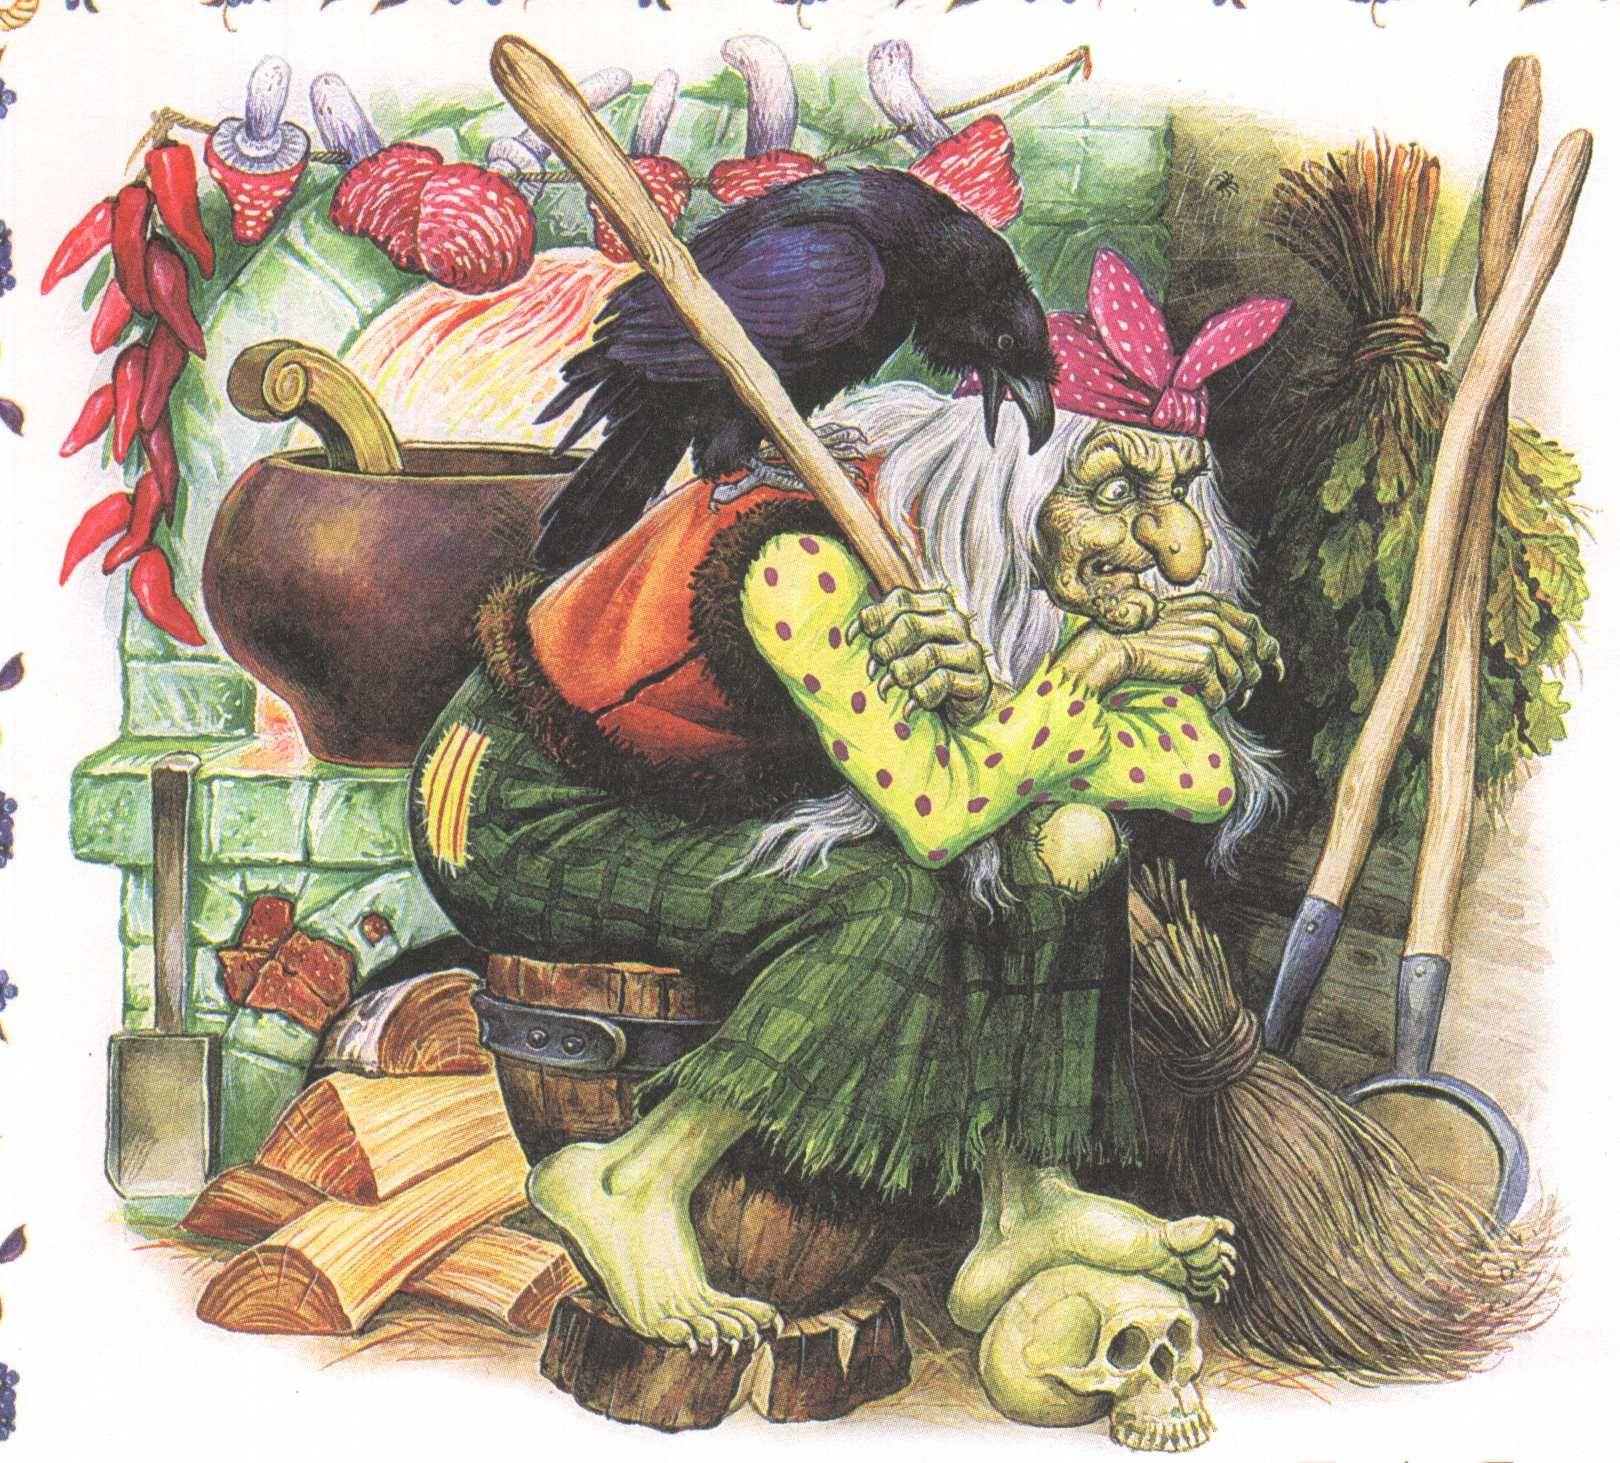 Картинка бабы-яги из сказки